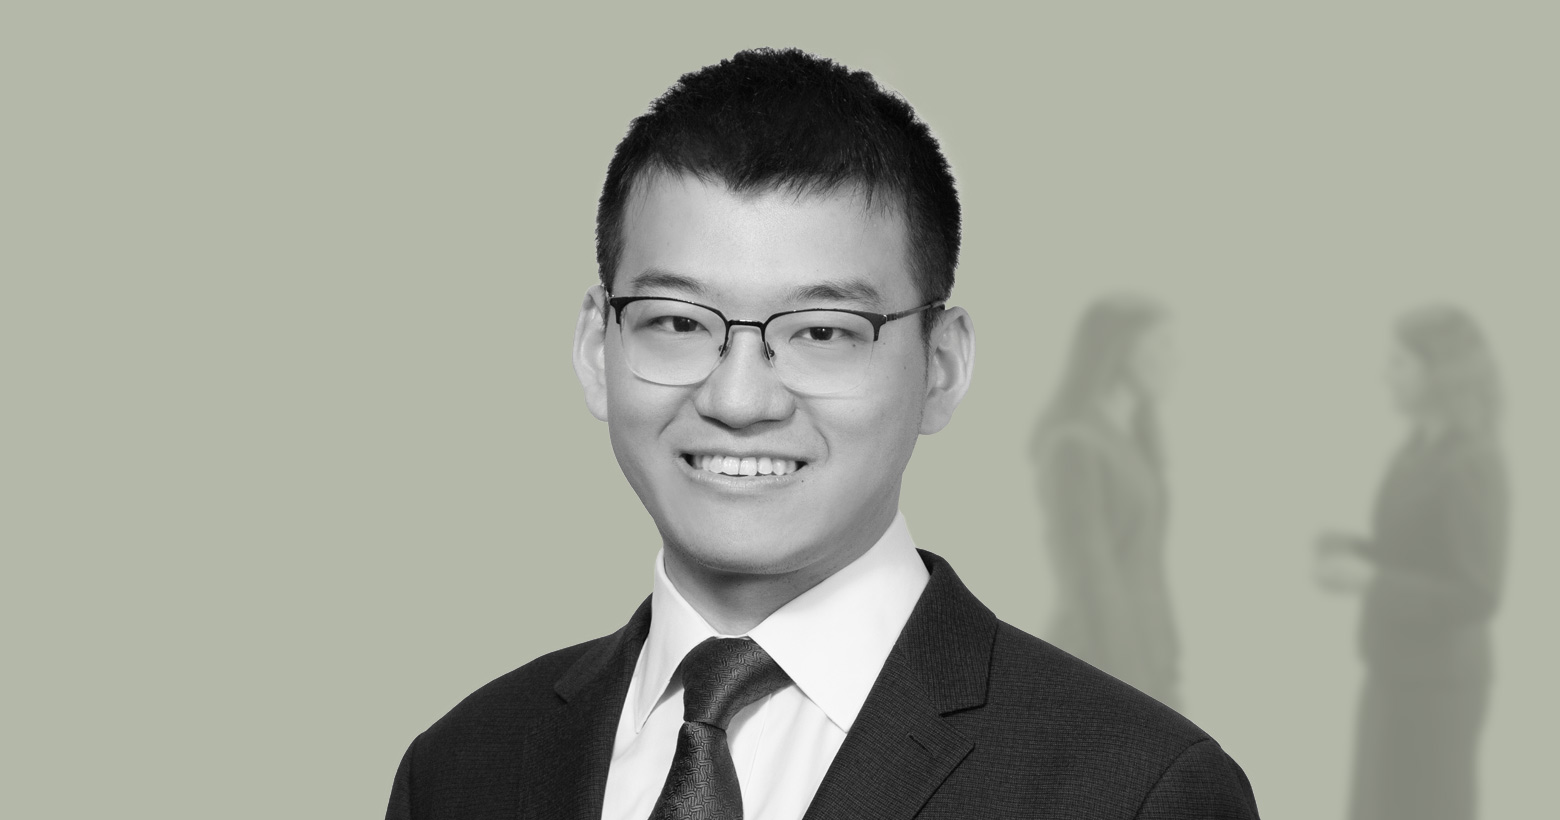 Linfeng Zhu